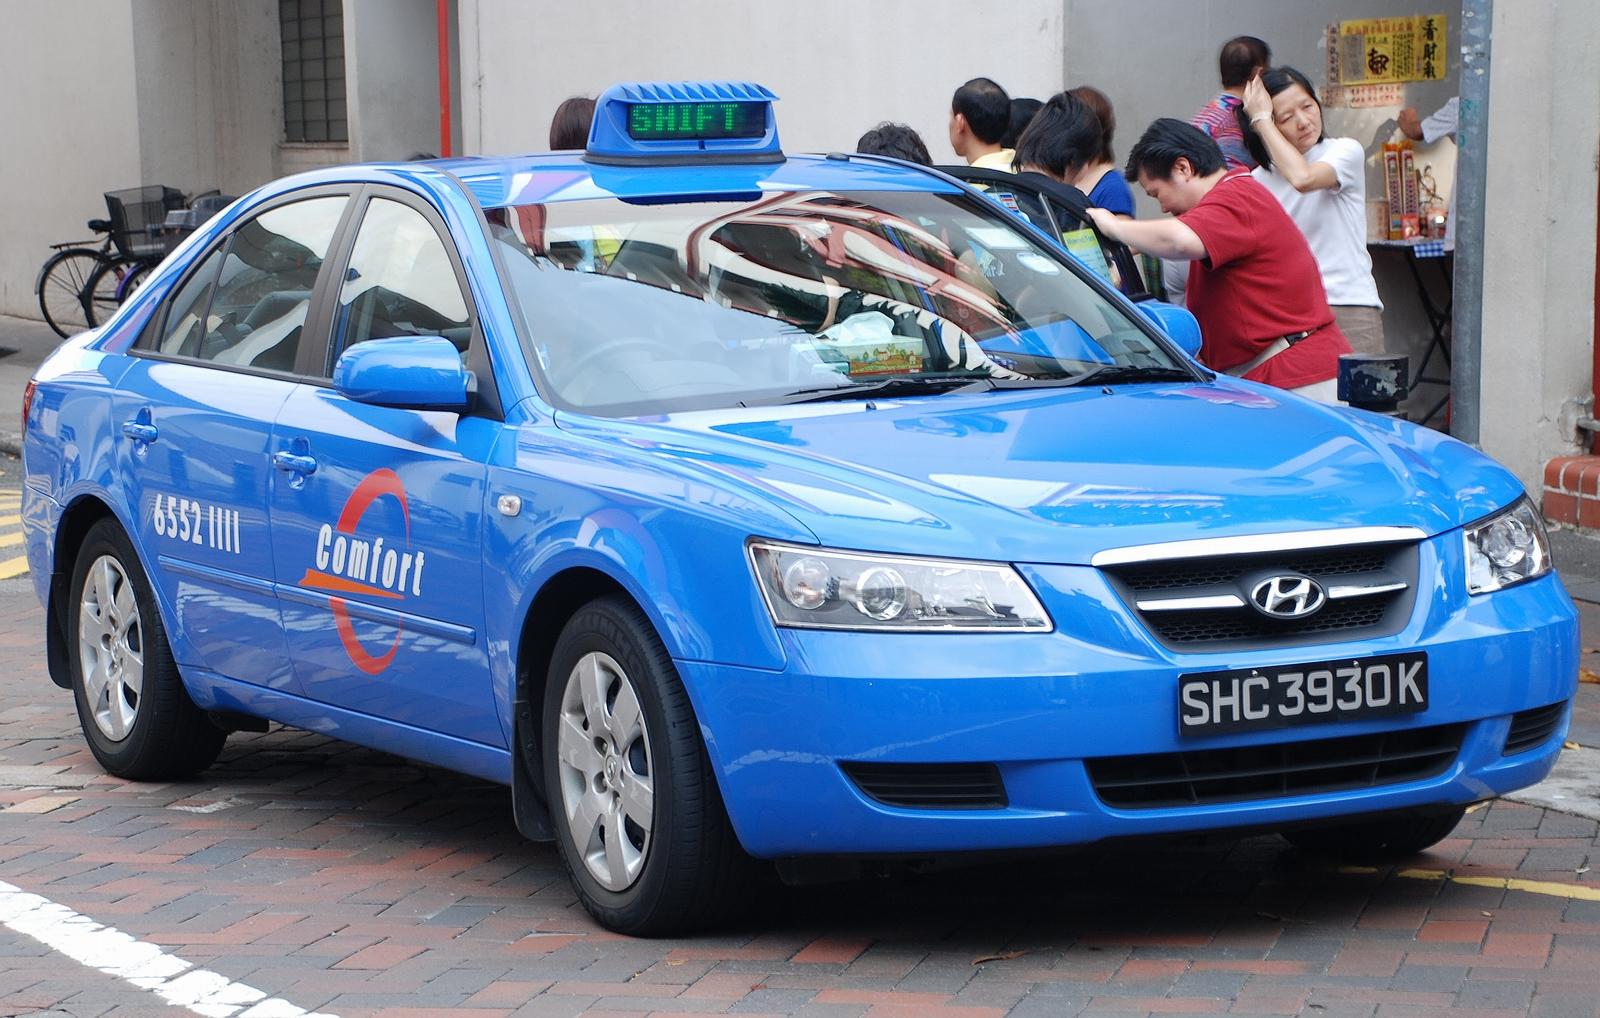 File:Comfort Hyundai Sonata taxi.jpg - Wikimedia Commons